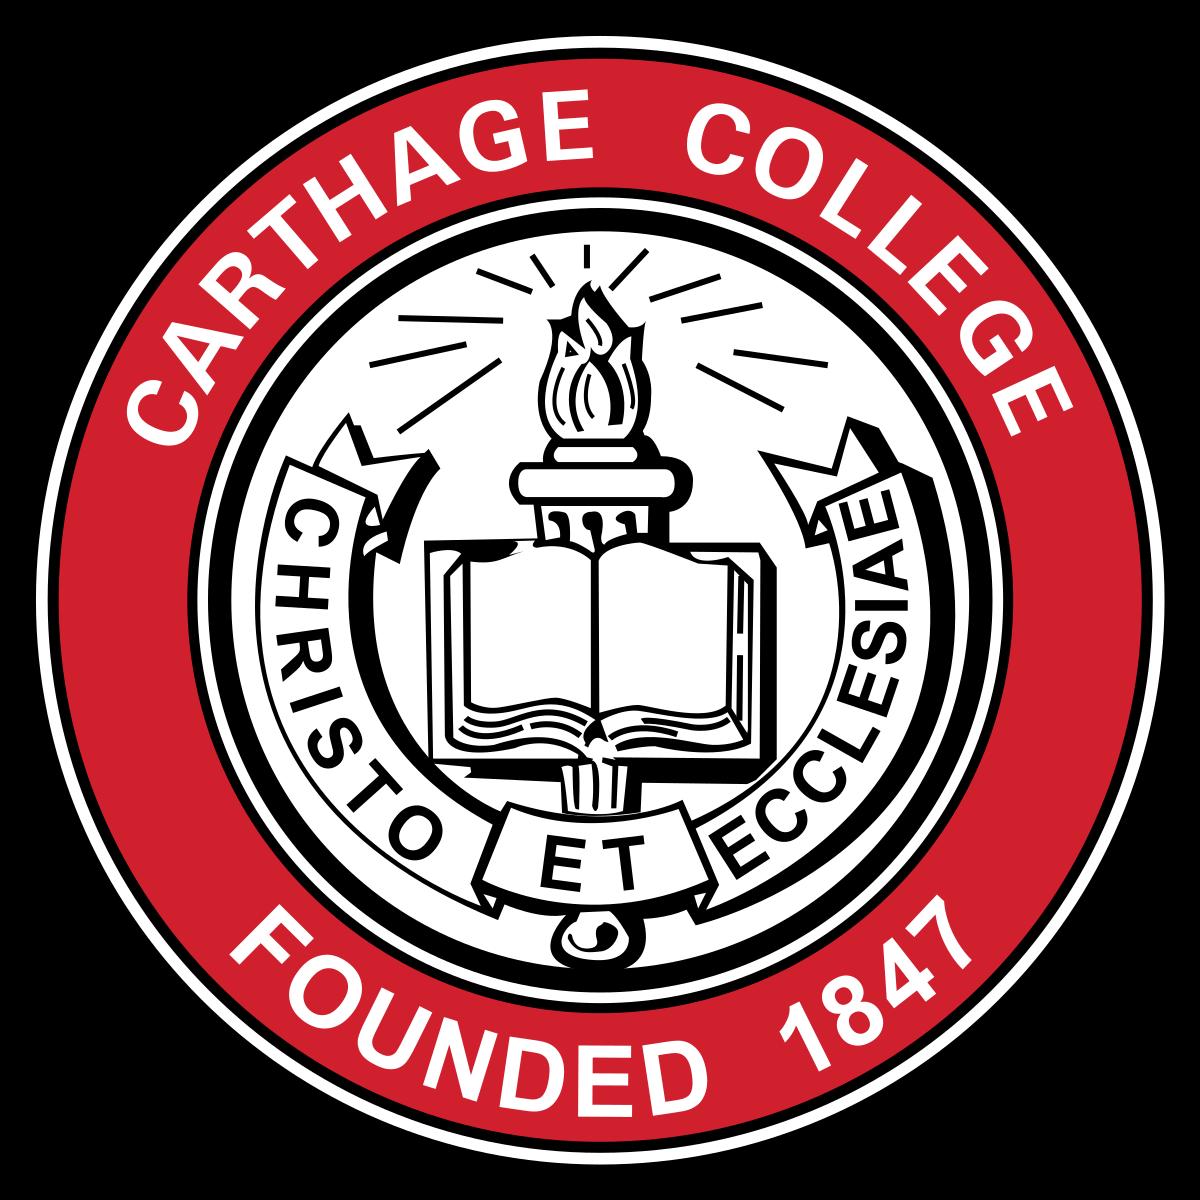 Carthage College.